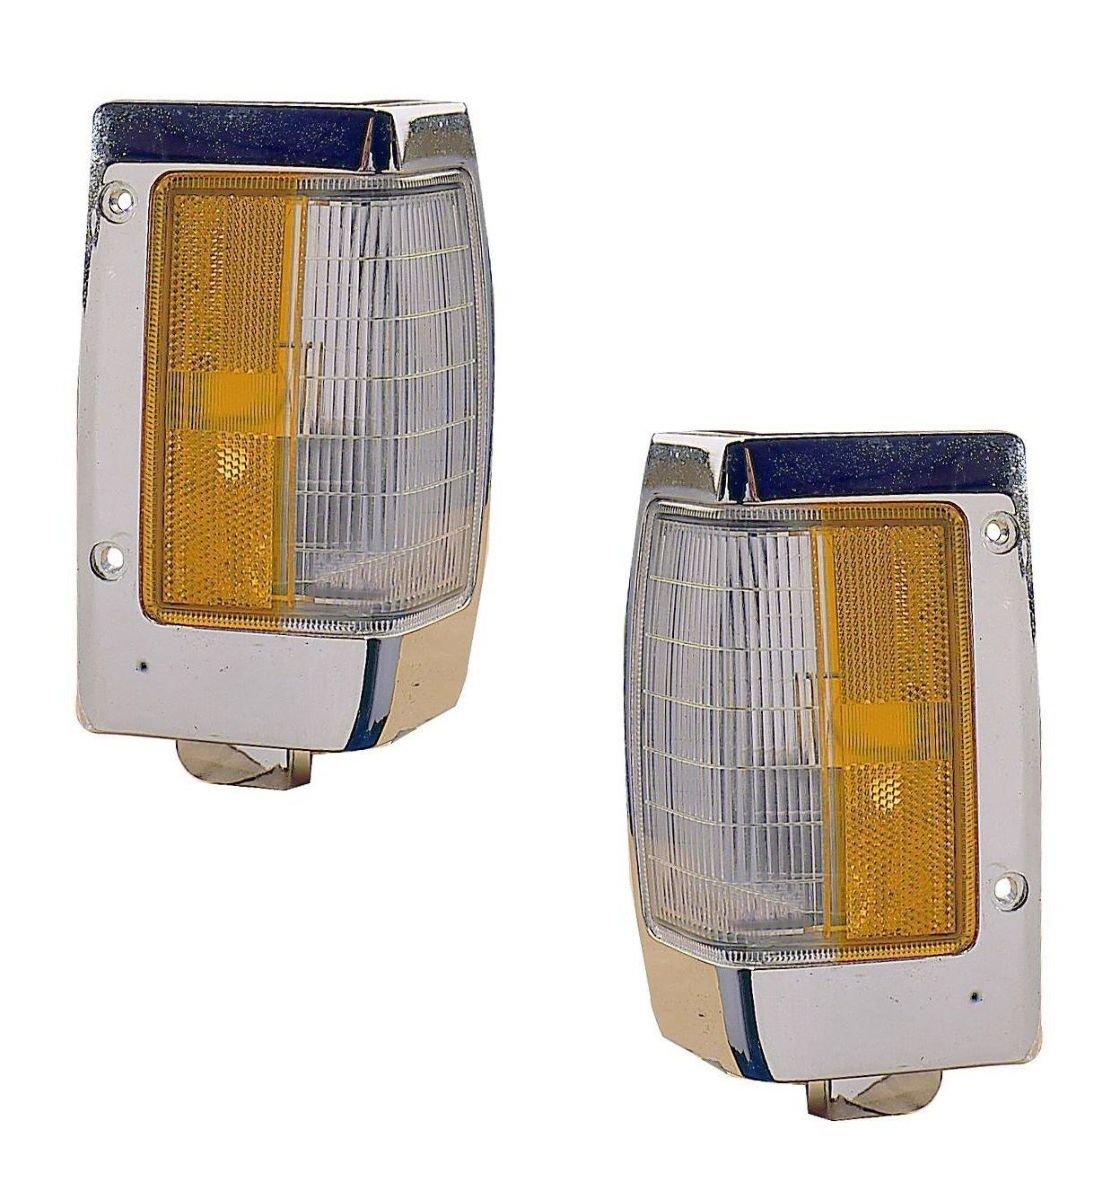 1990-1997 Nissan D21 Hardbody Pickup Truck Turn Signal Marker Lamp (with Chrome Trim) Corner Park Light Pair Set Left Driver And Right Passenger Side (1990 90 1991 91 1992 92 1993 93 1994 94 1995 95 1996 96 1997 97) Aftermarket